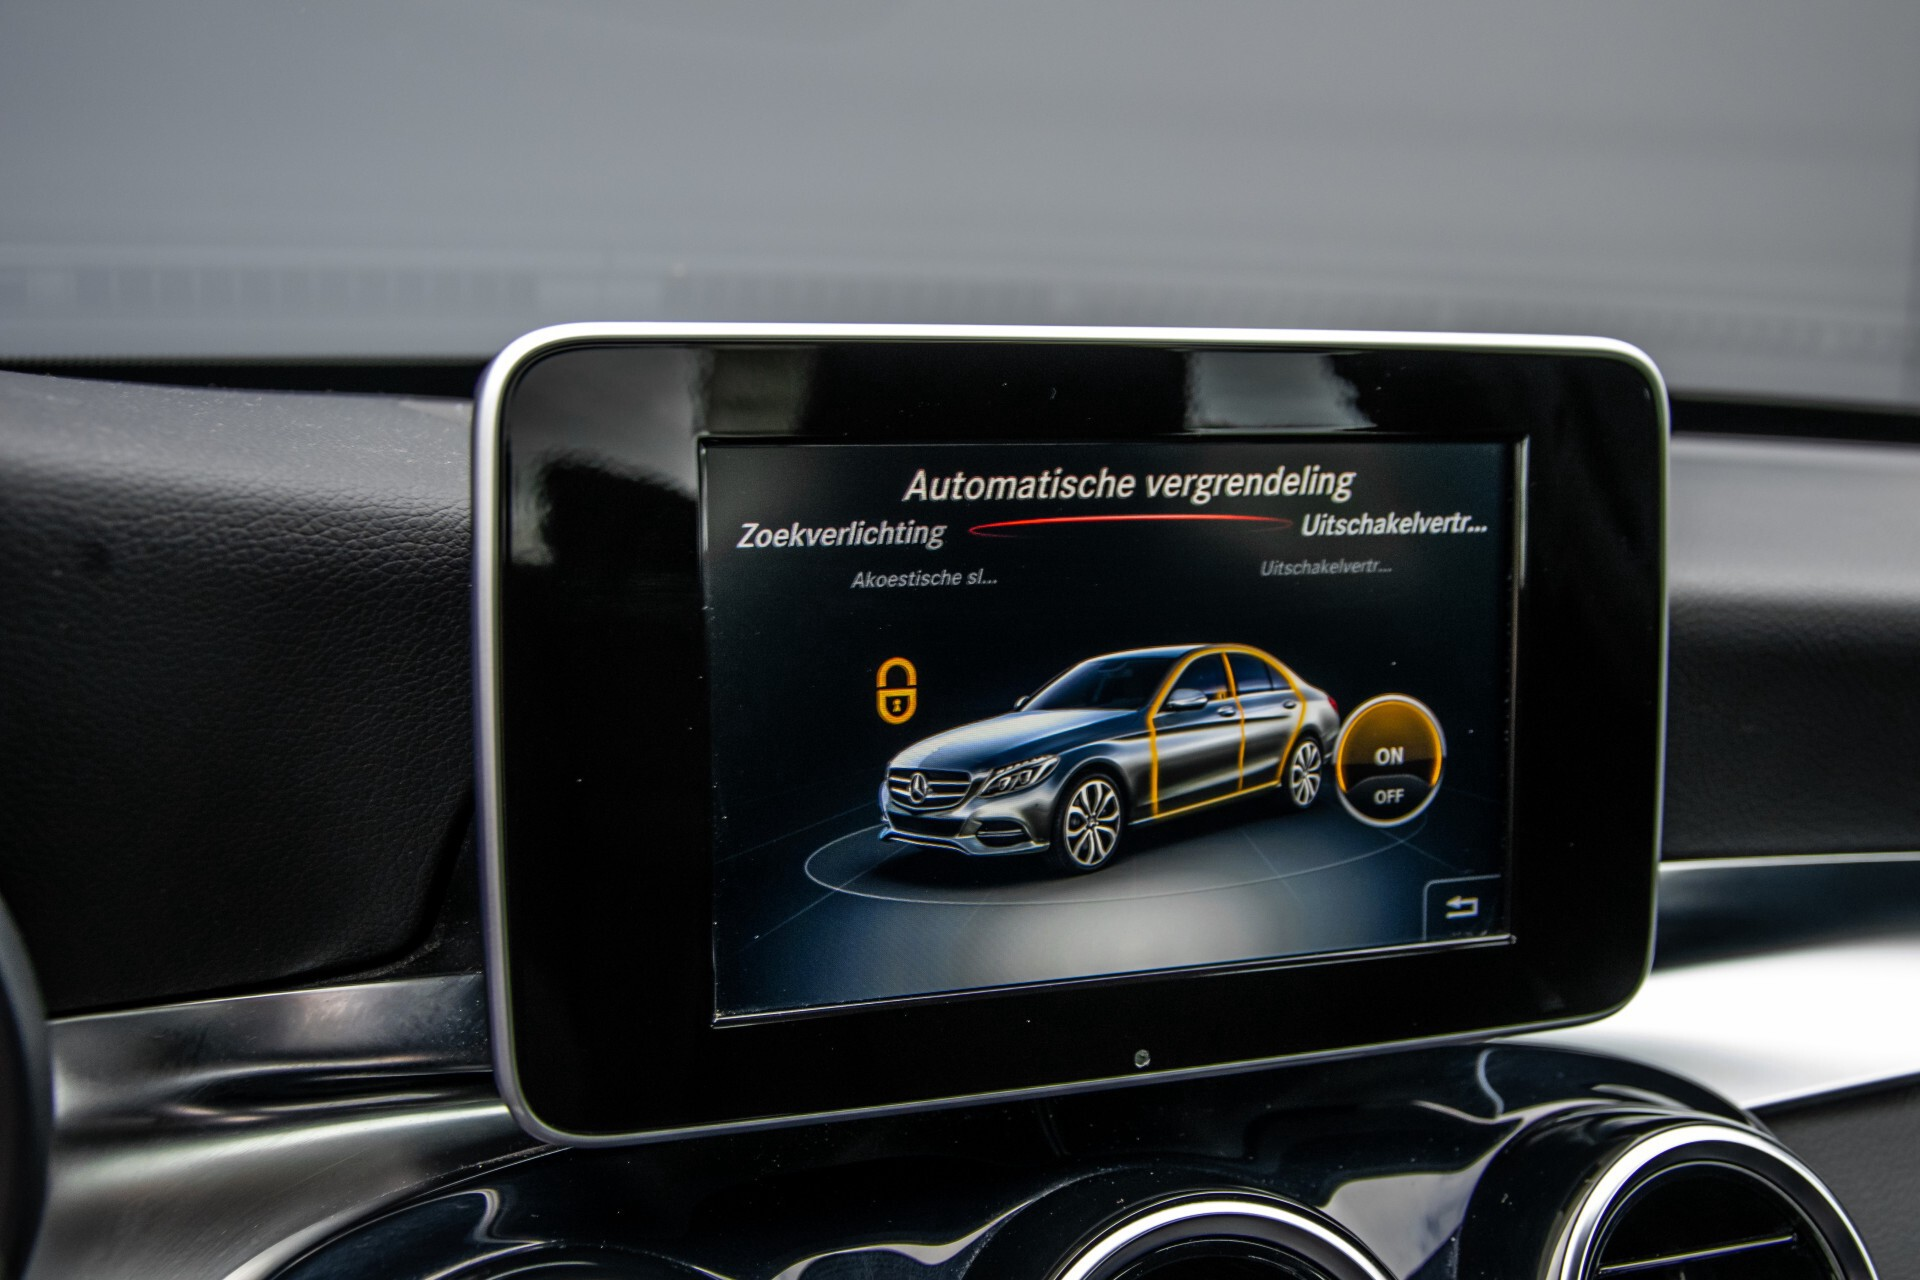 Mercedes-Benz C-Klasse 180 Bluetec Lease Edition Intelligent Light System/Cruise Control/Navi Foto 22